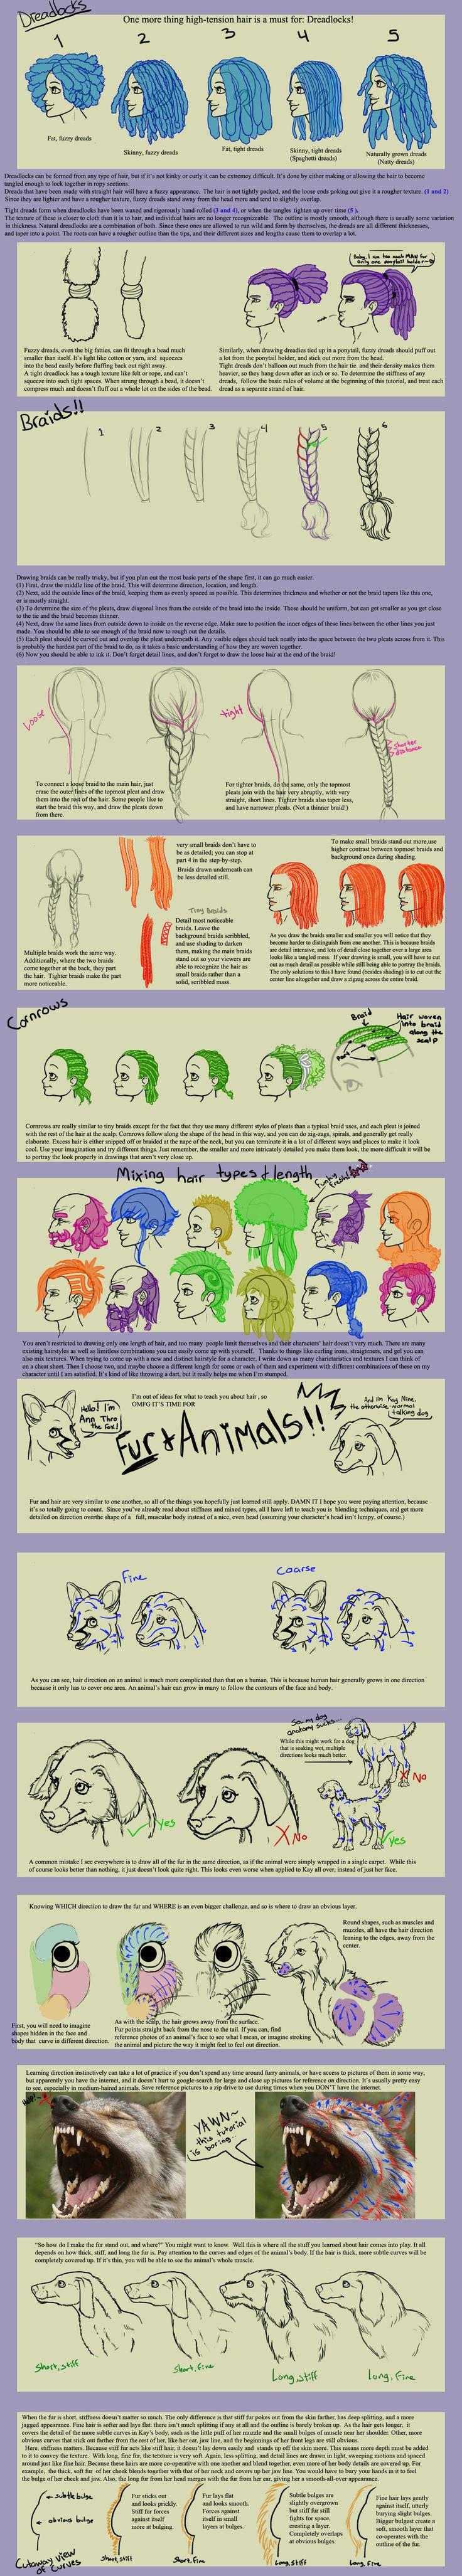 Gribby's super-thorough Hair Tutorial3 by Deskleaves.deviantart.com on @deviantART